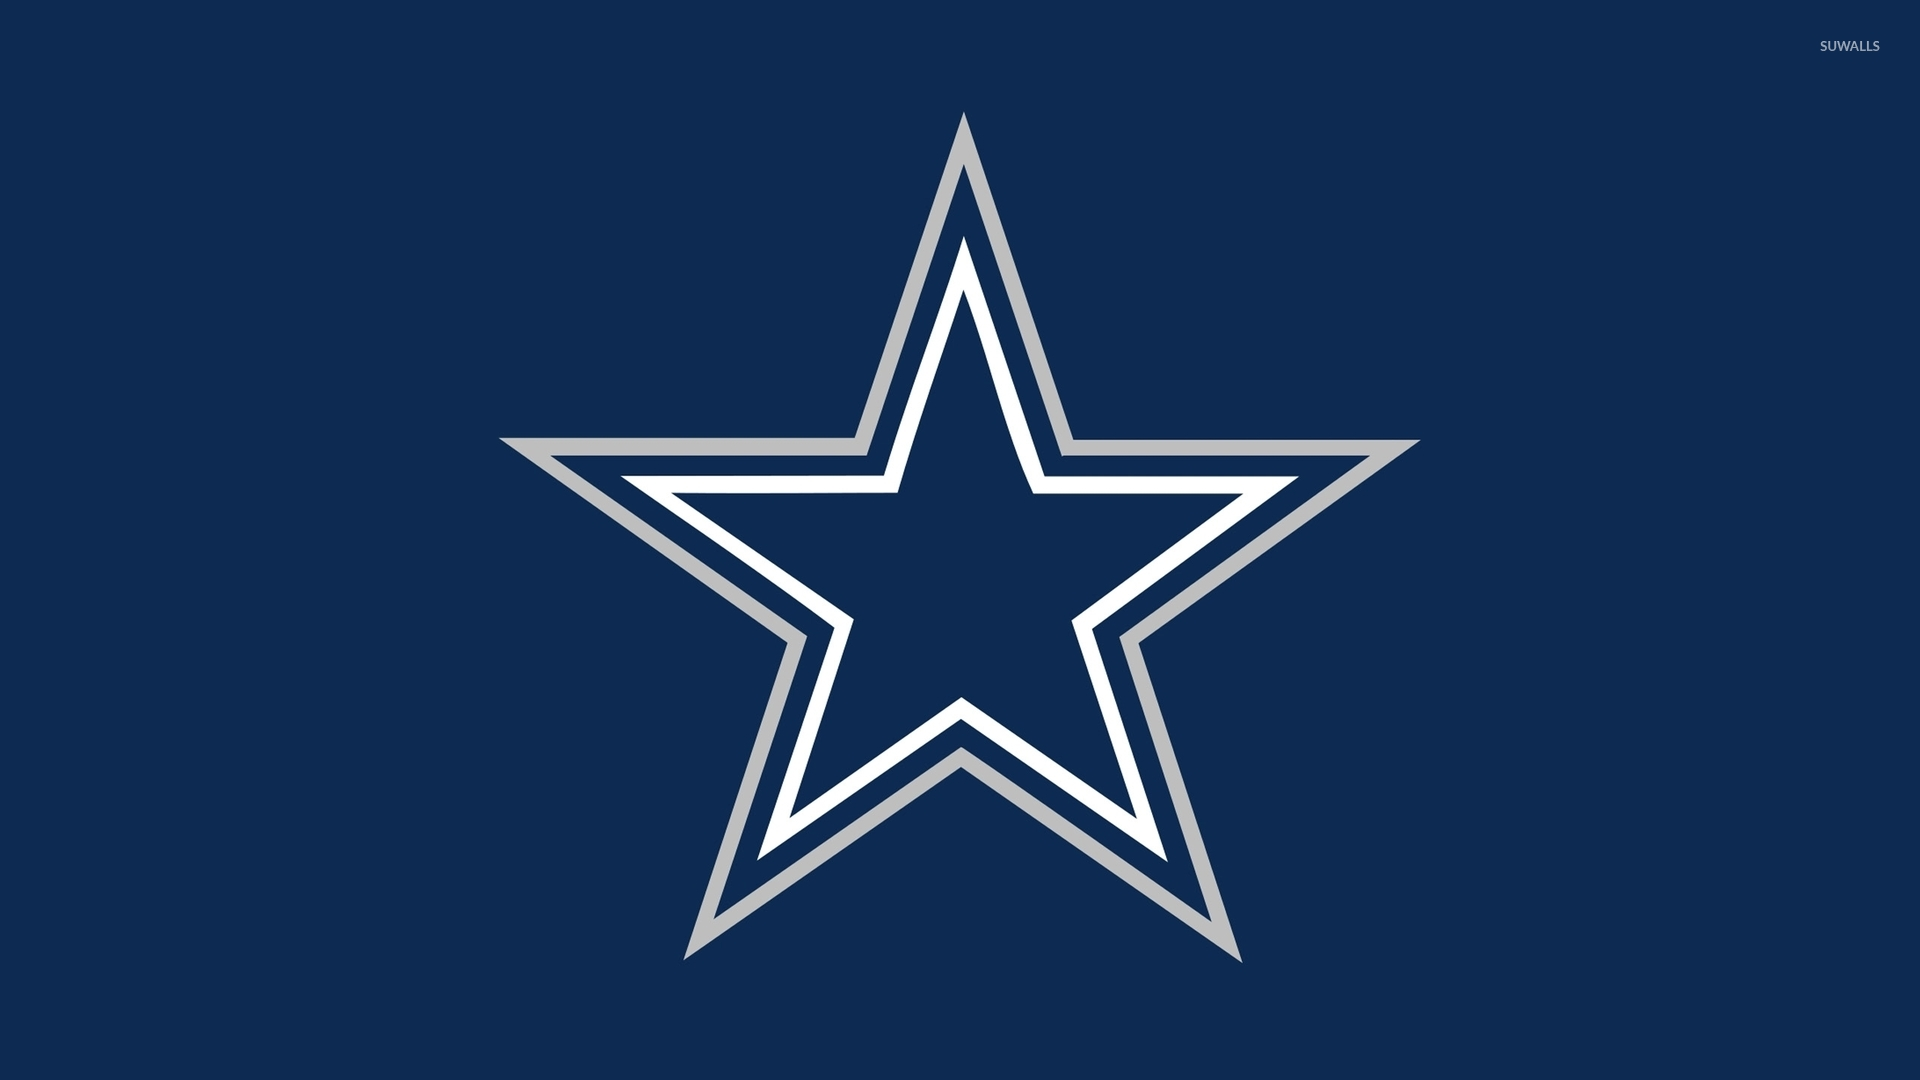 Dallas Cowboys wallpaper   Sport wallpapers   33085 1920x1080